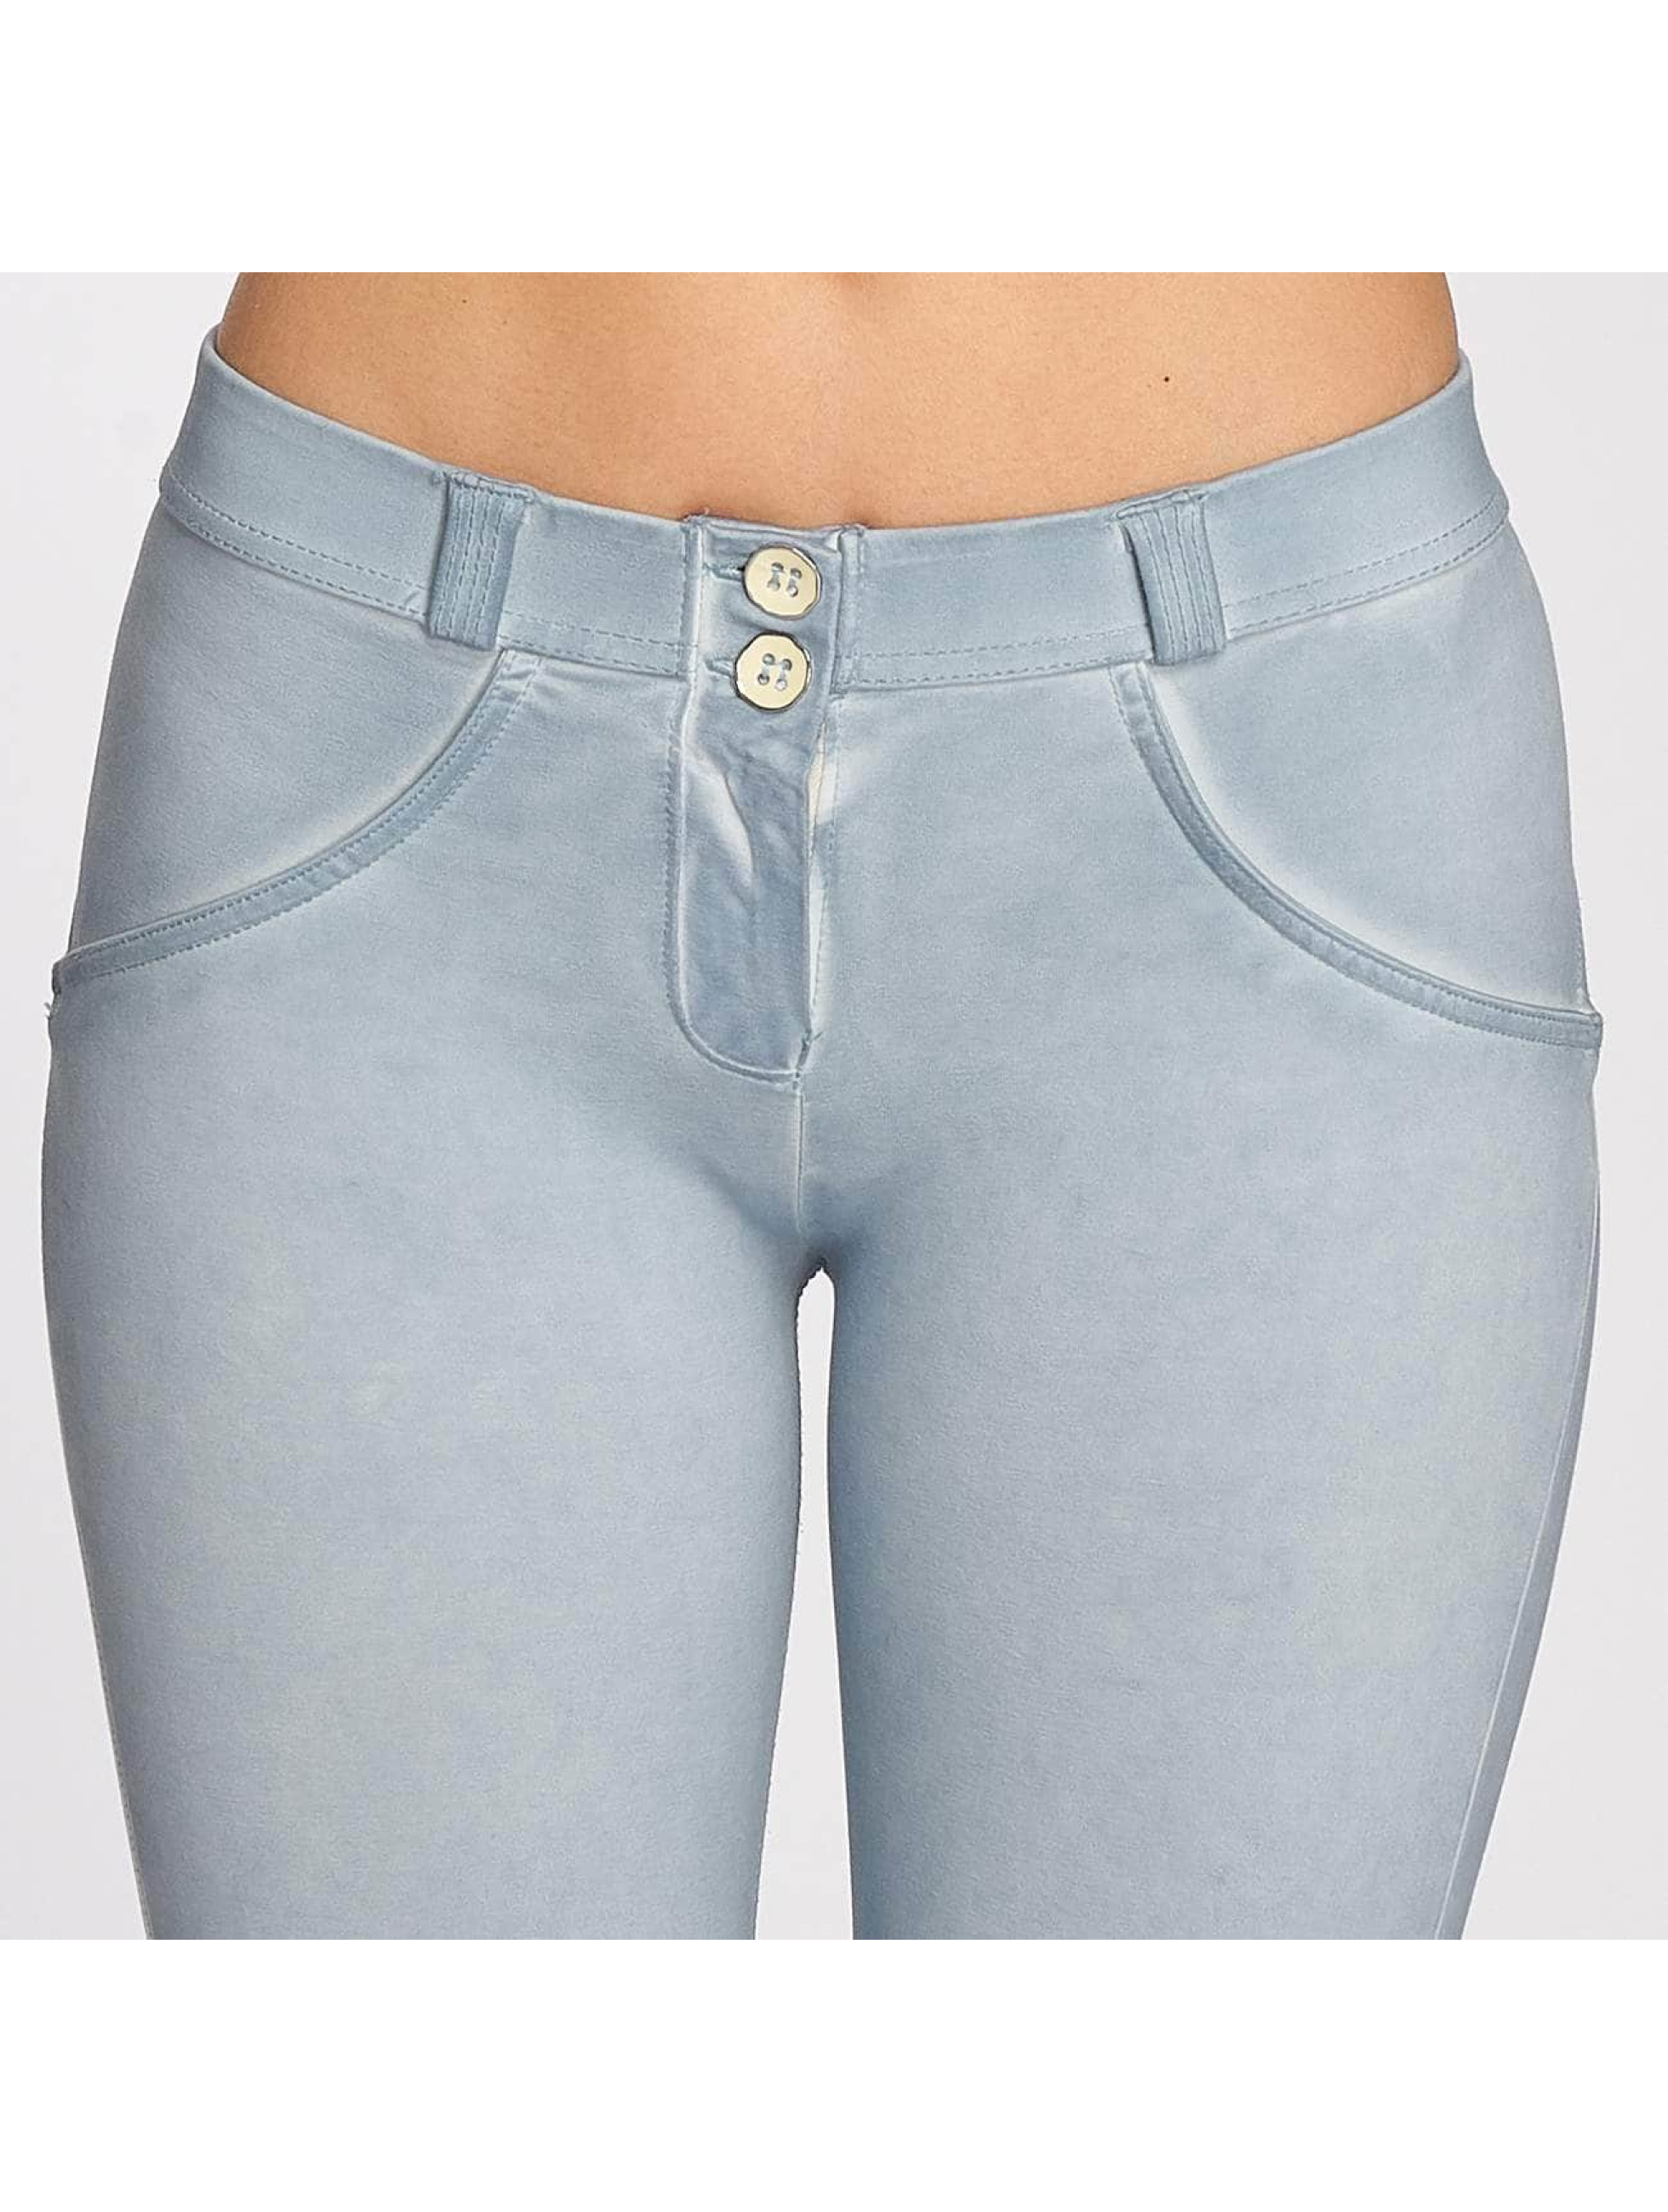 Freddy Skinny Jeans Pantalone 7/8 blue